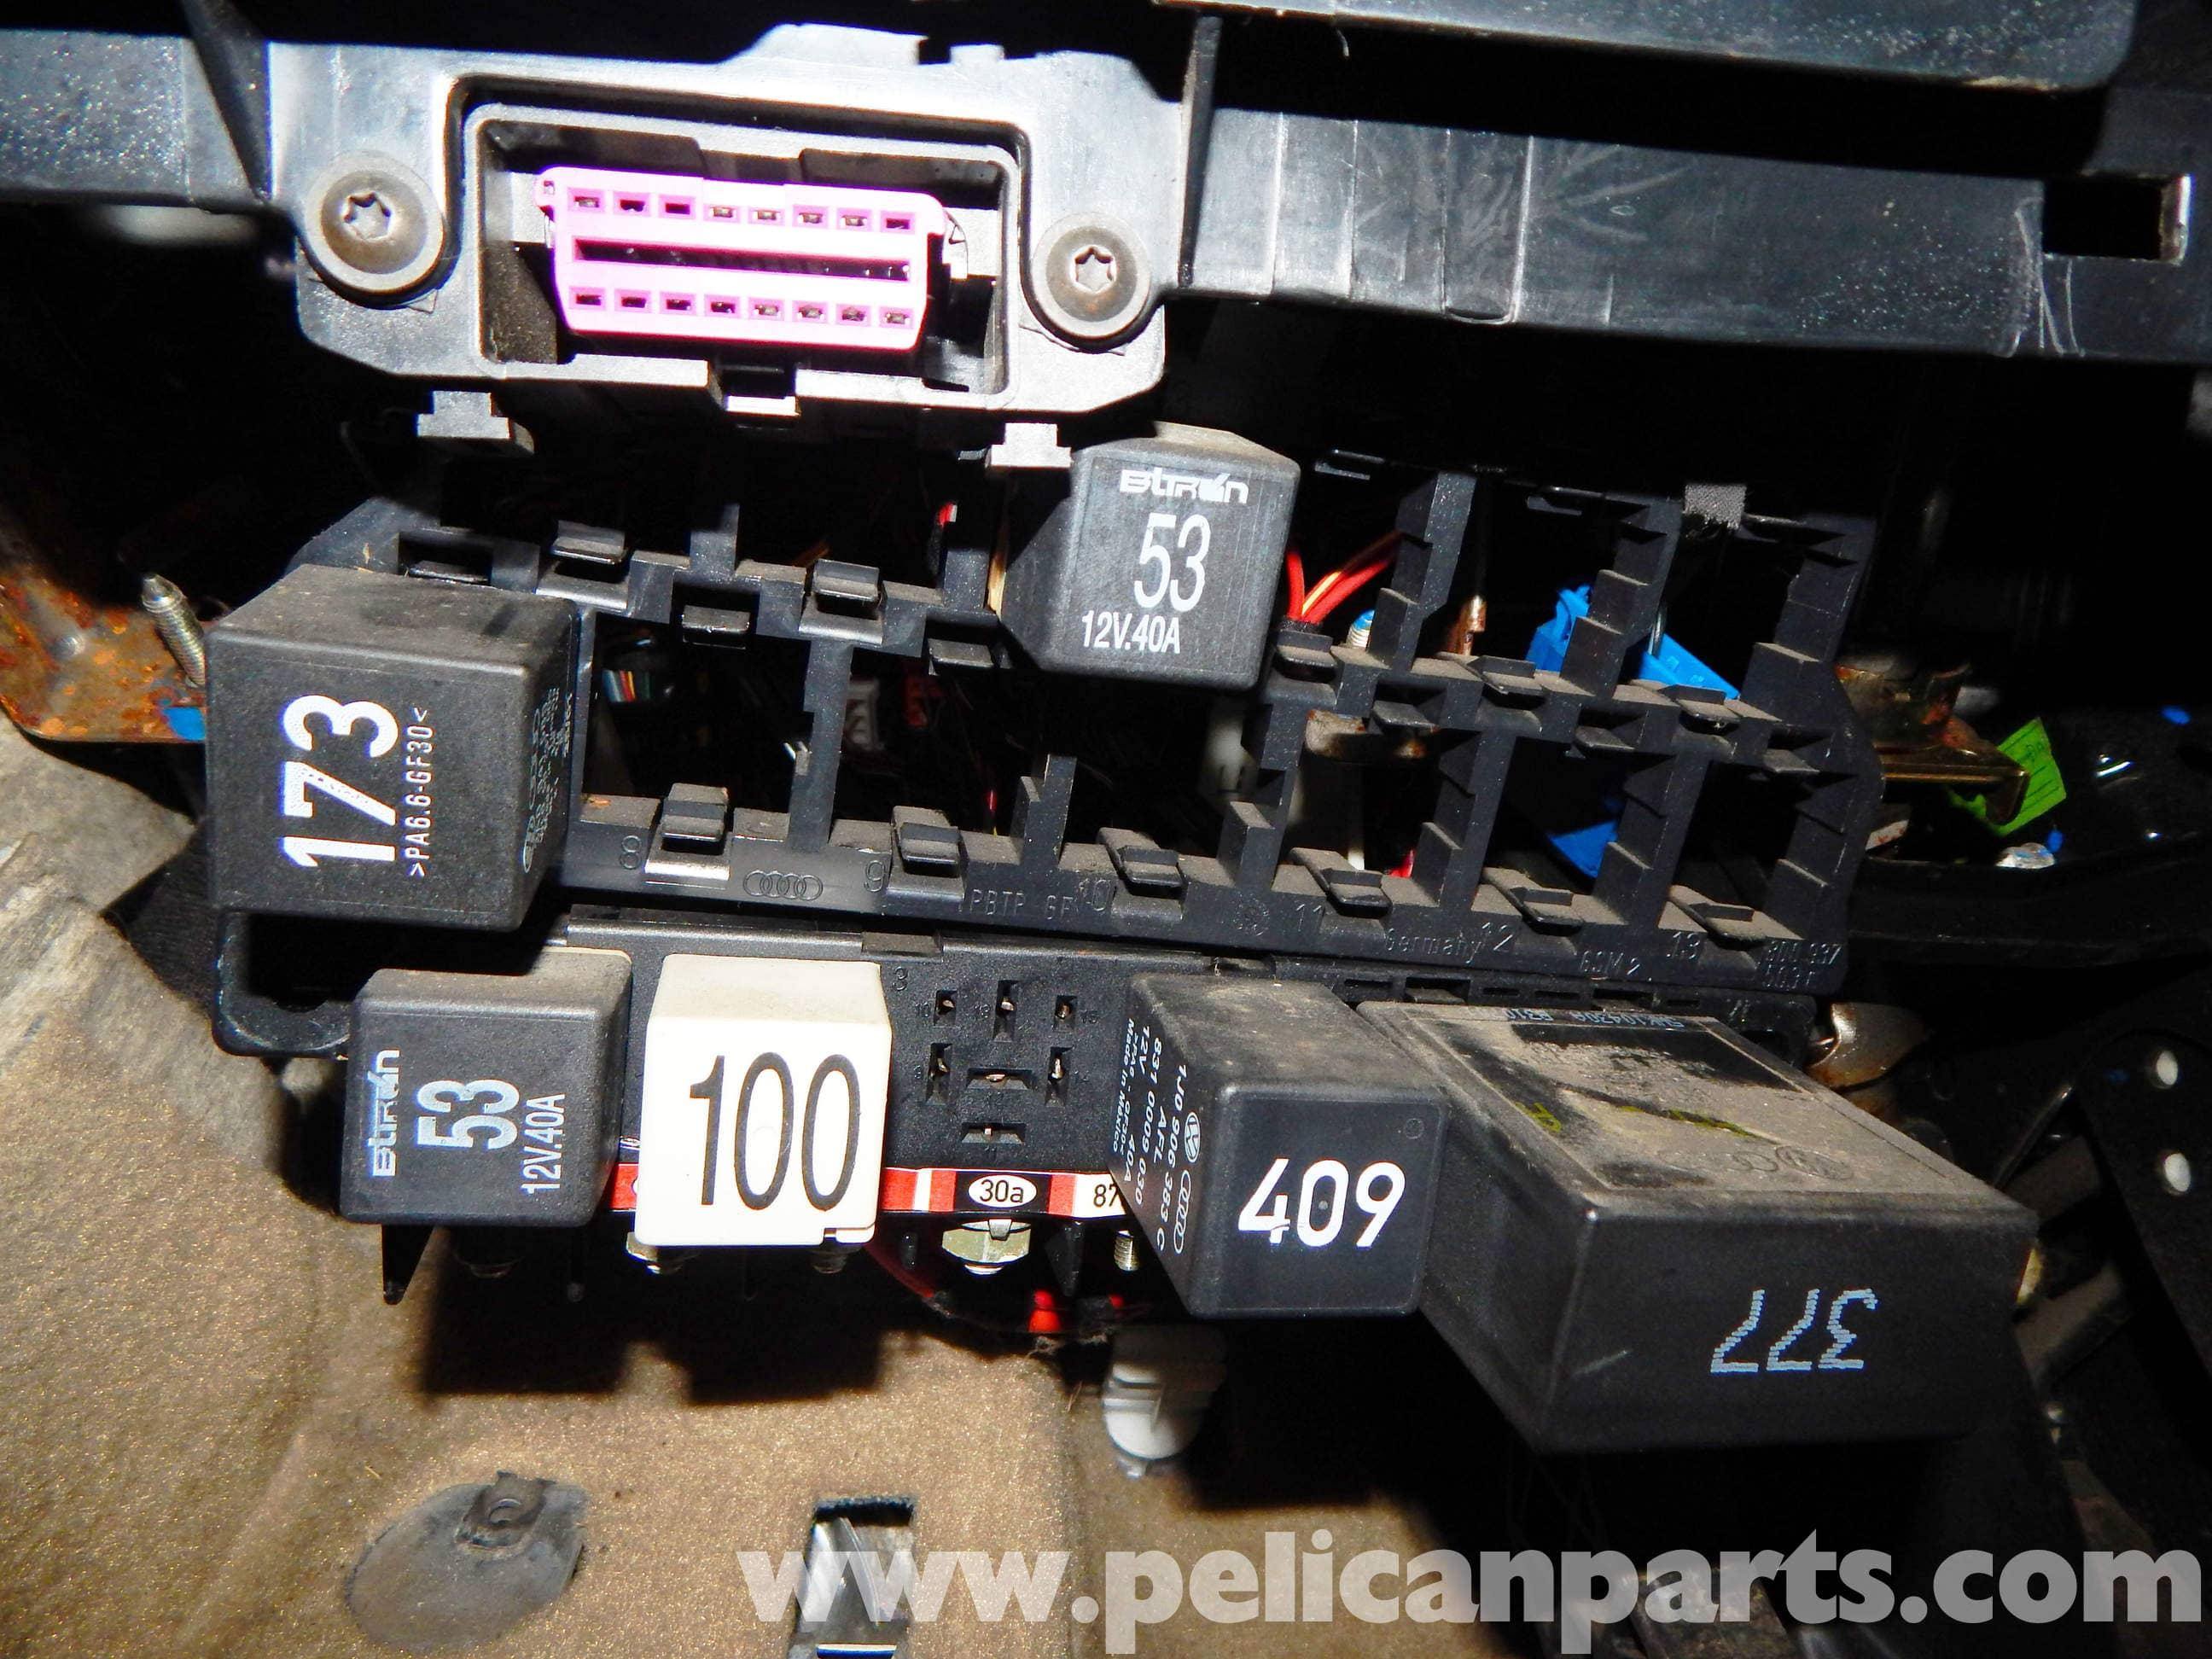 2007 Volkswagen Gti Fuse Box Diagram Volkswagen Jetta Mkiv Relay Panel Access And Relay